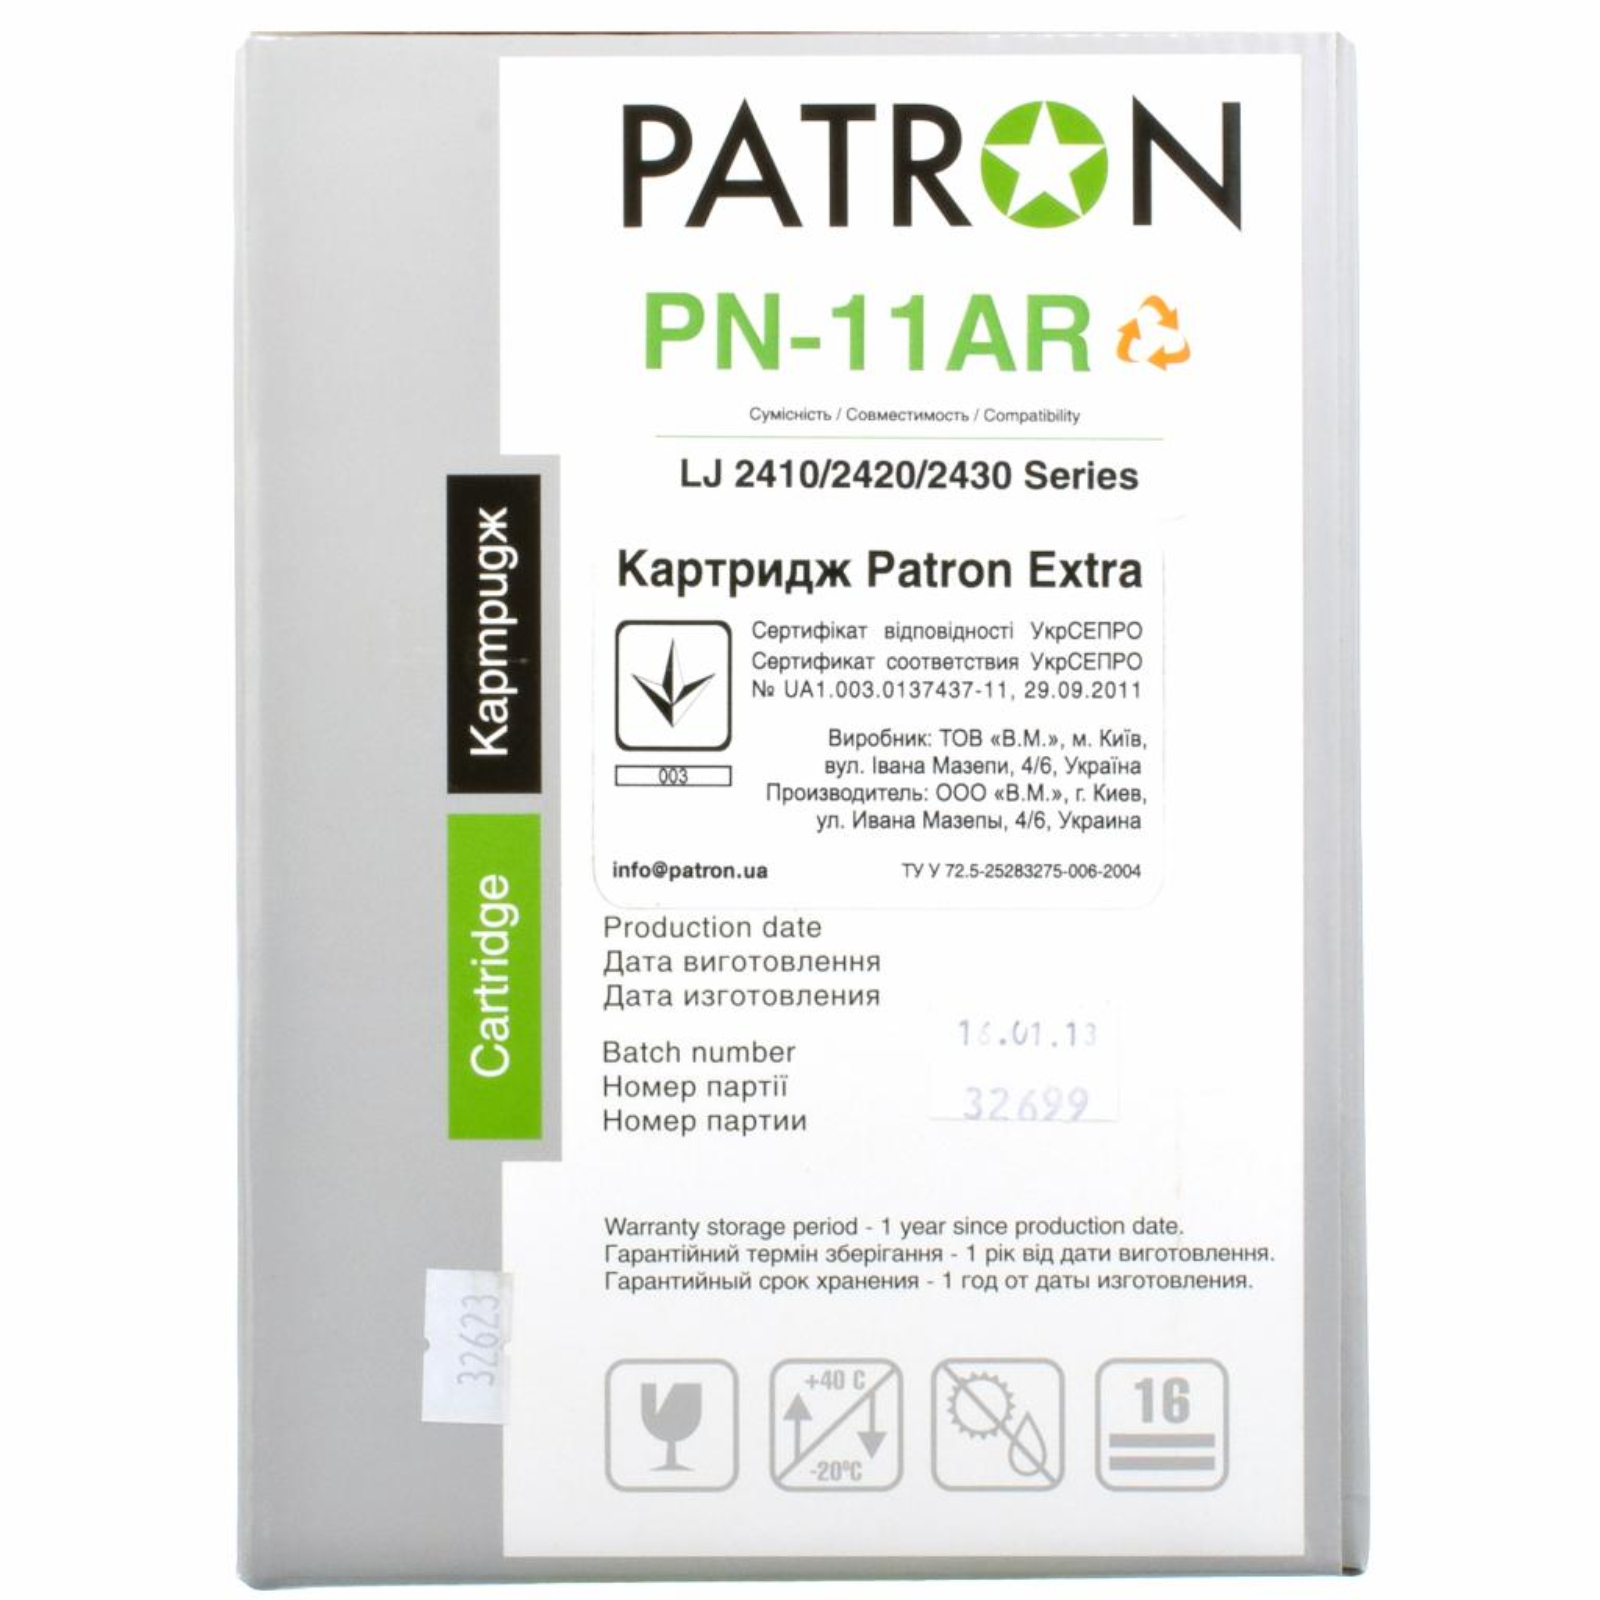 Картридж PATRON HP LJ2410/2420/2430 /Q6511A (PN-11AR) Extra (CT-HP-Q6511A-PN-R) изображение 5